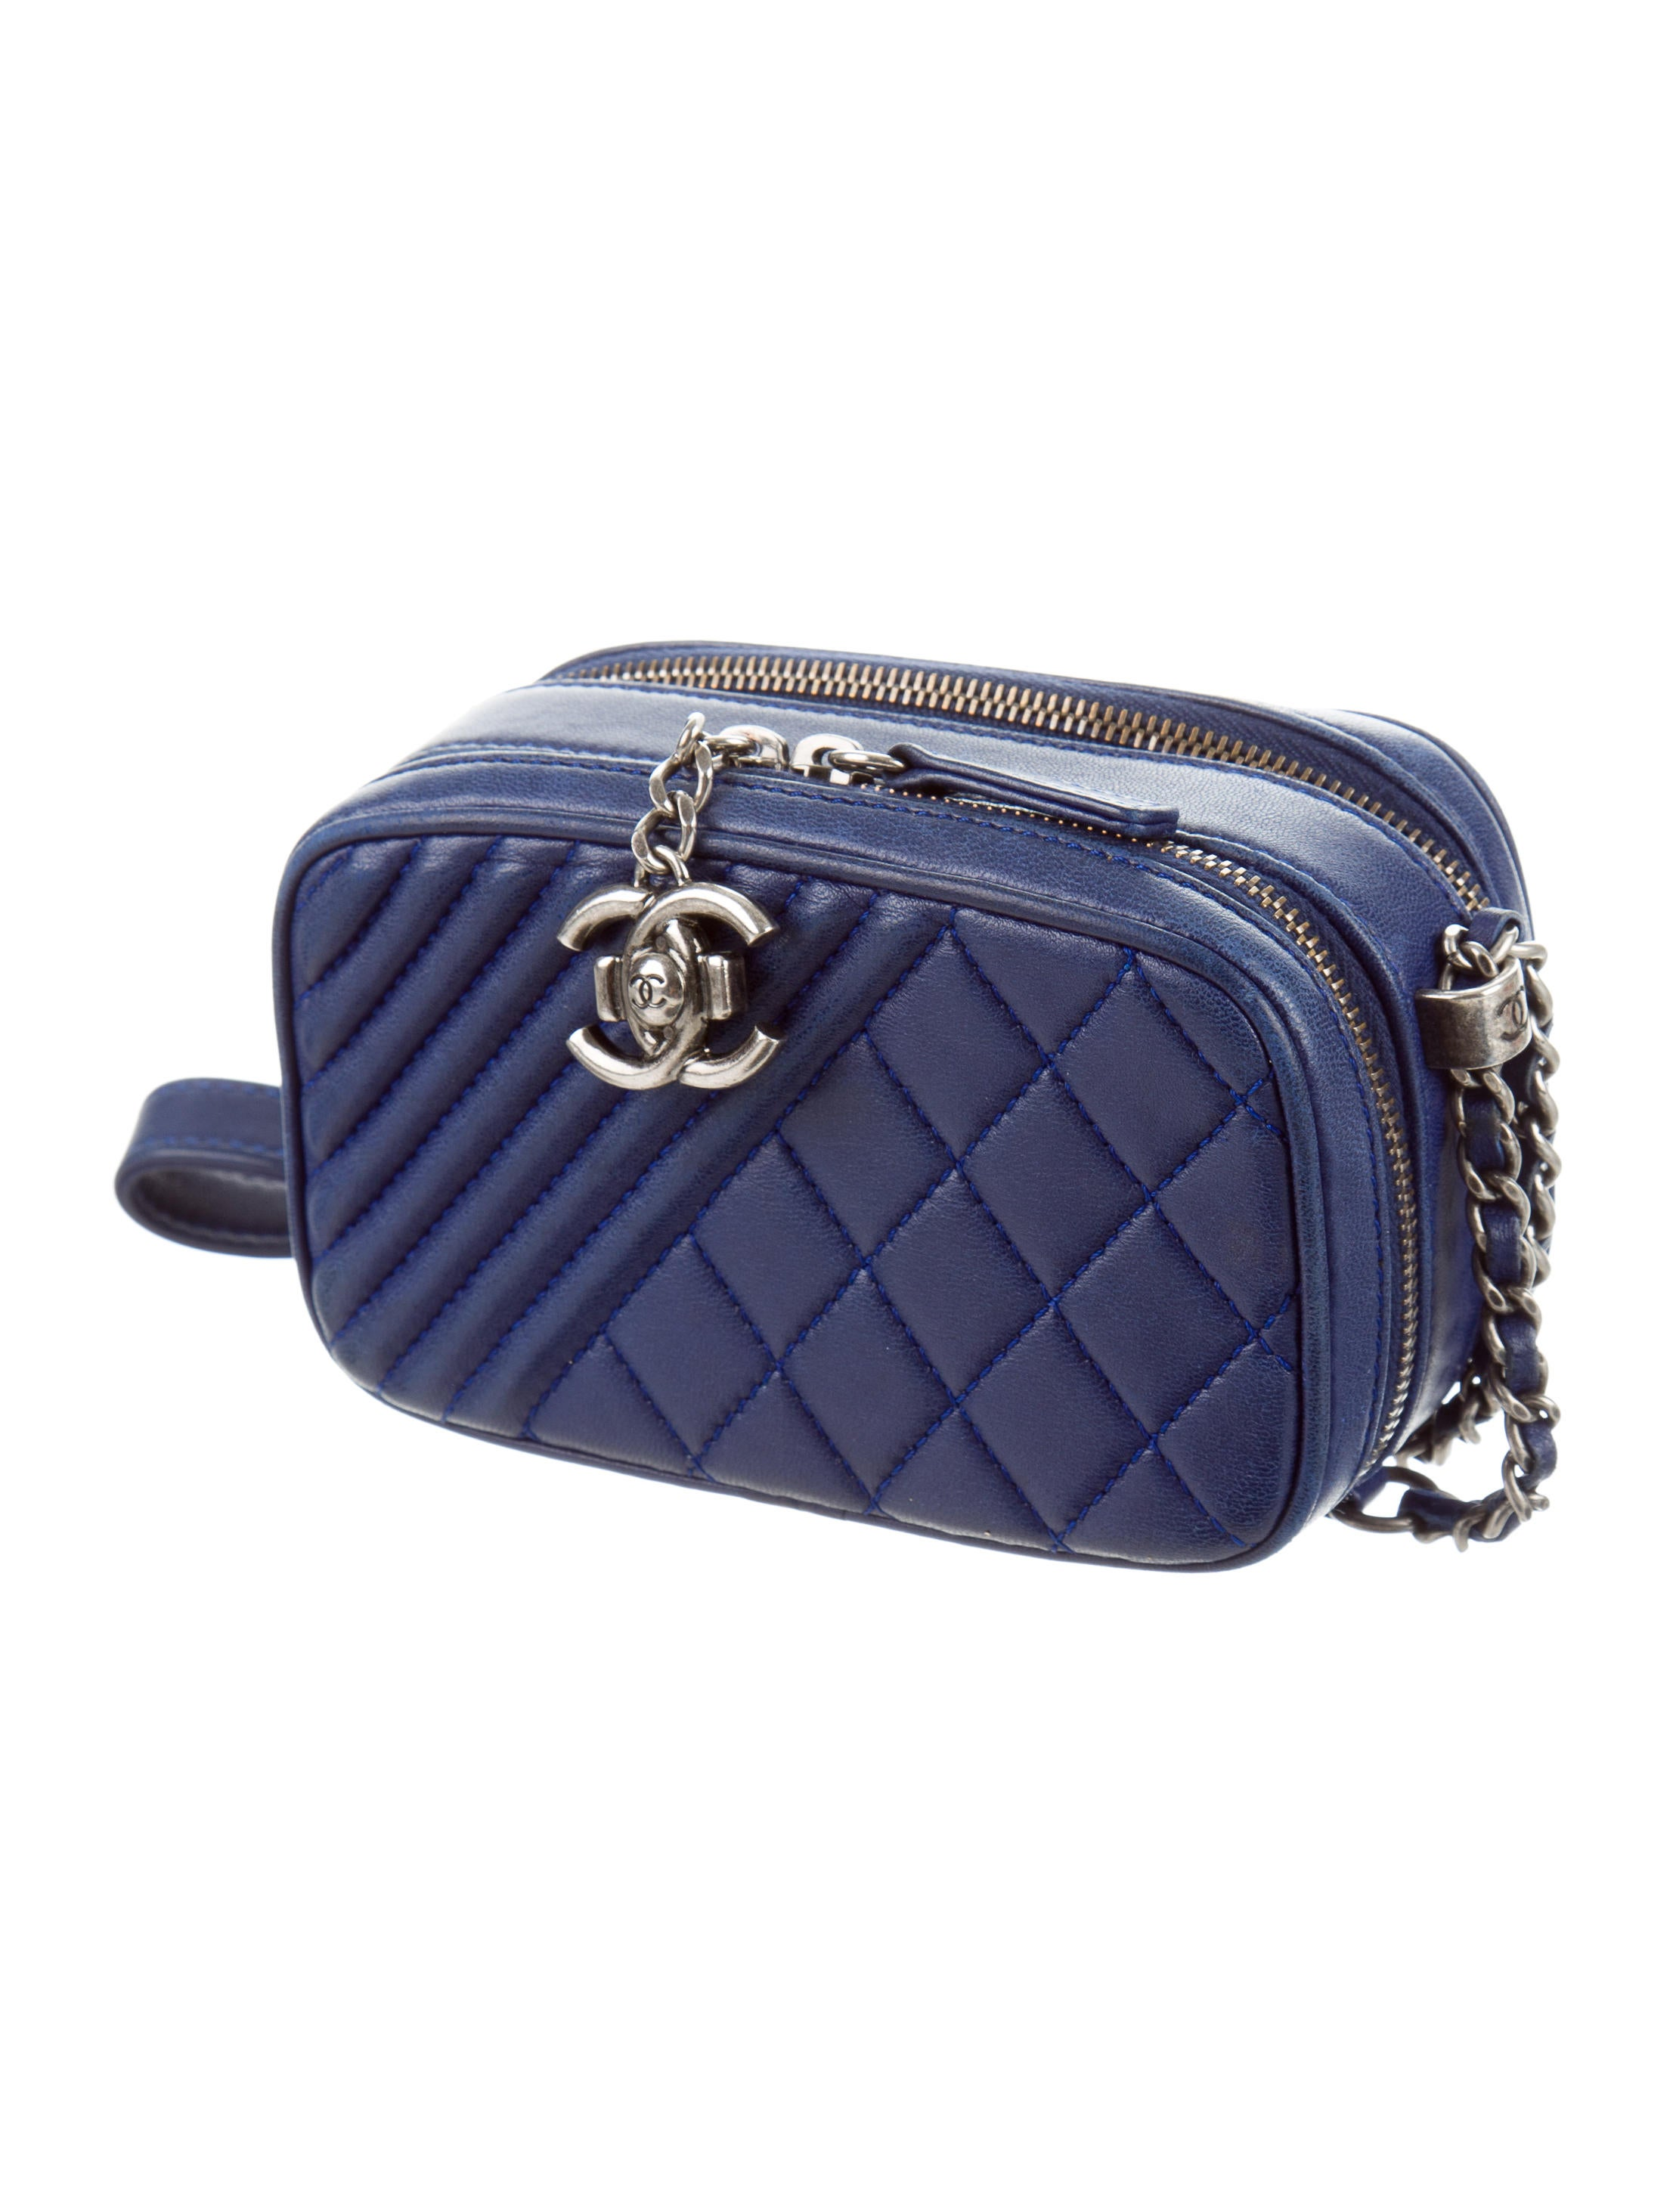 Chanel Mini Coco Boy Camera Crossbody Bag